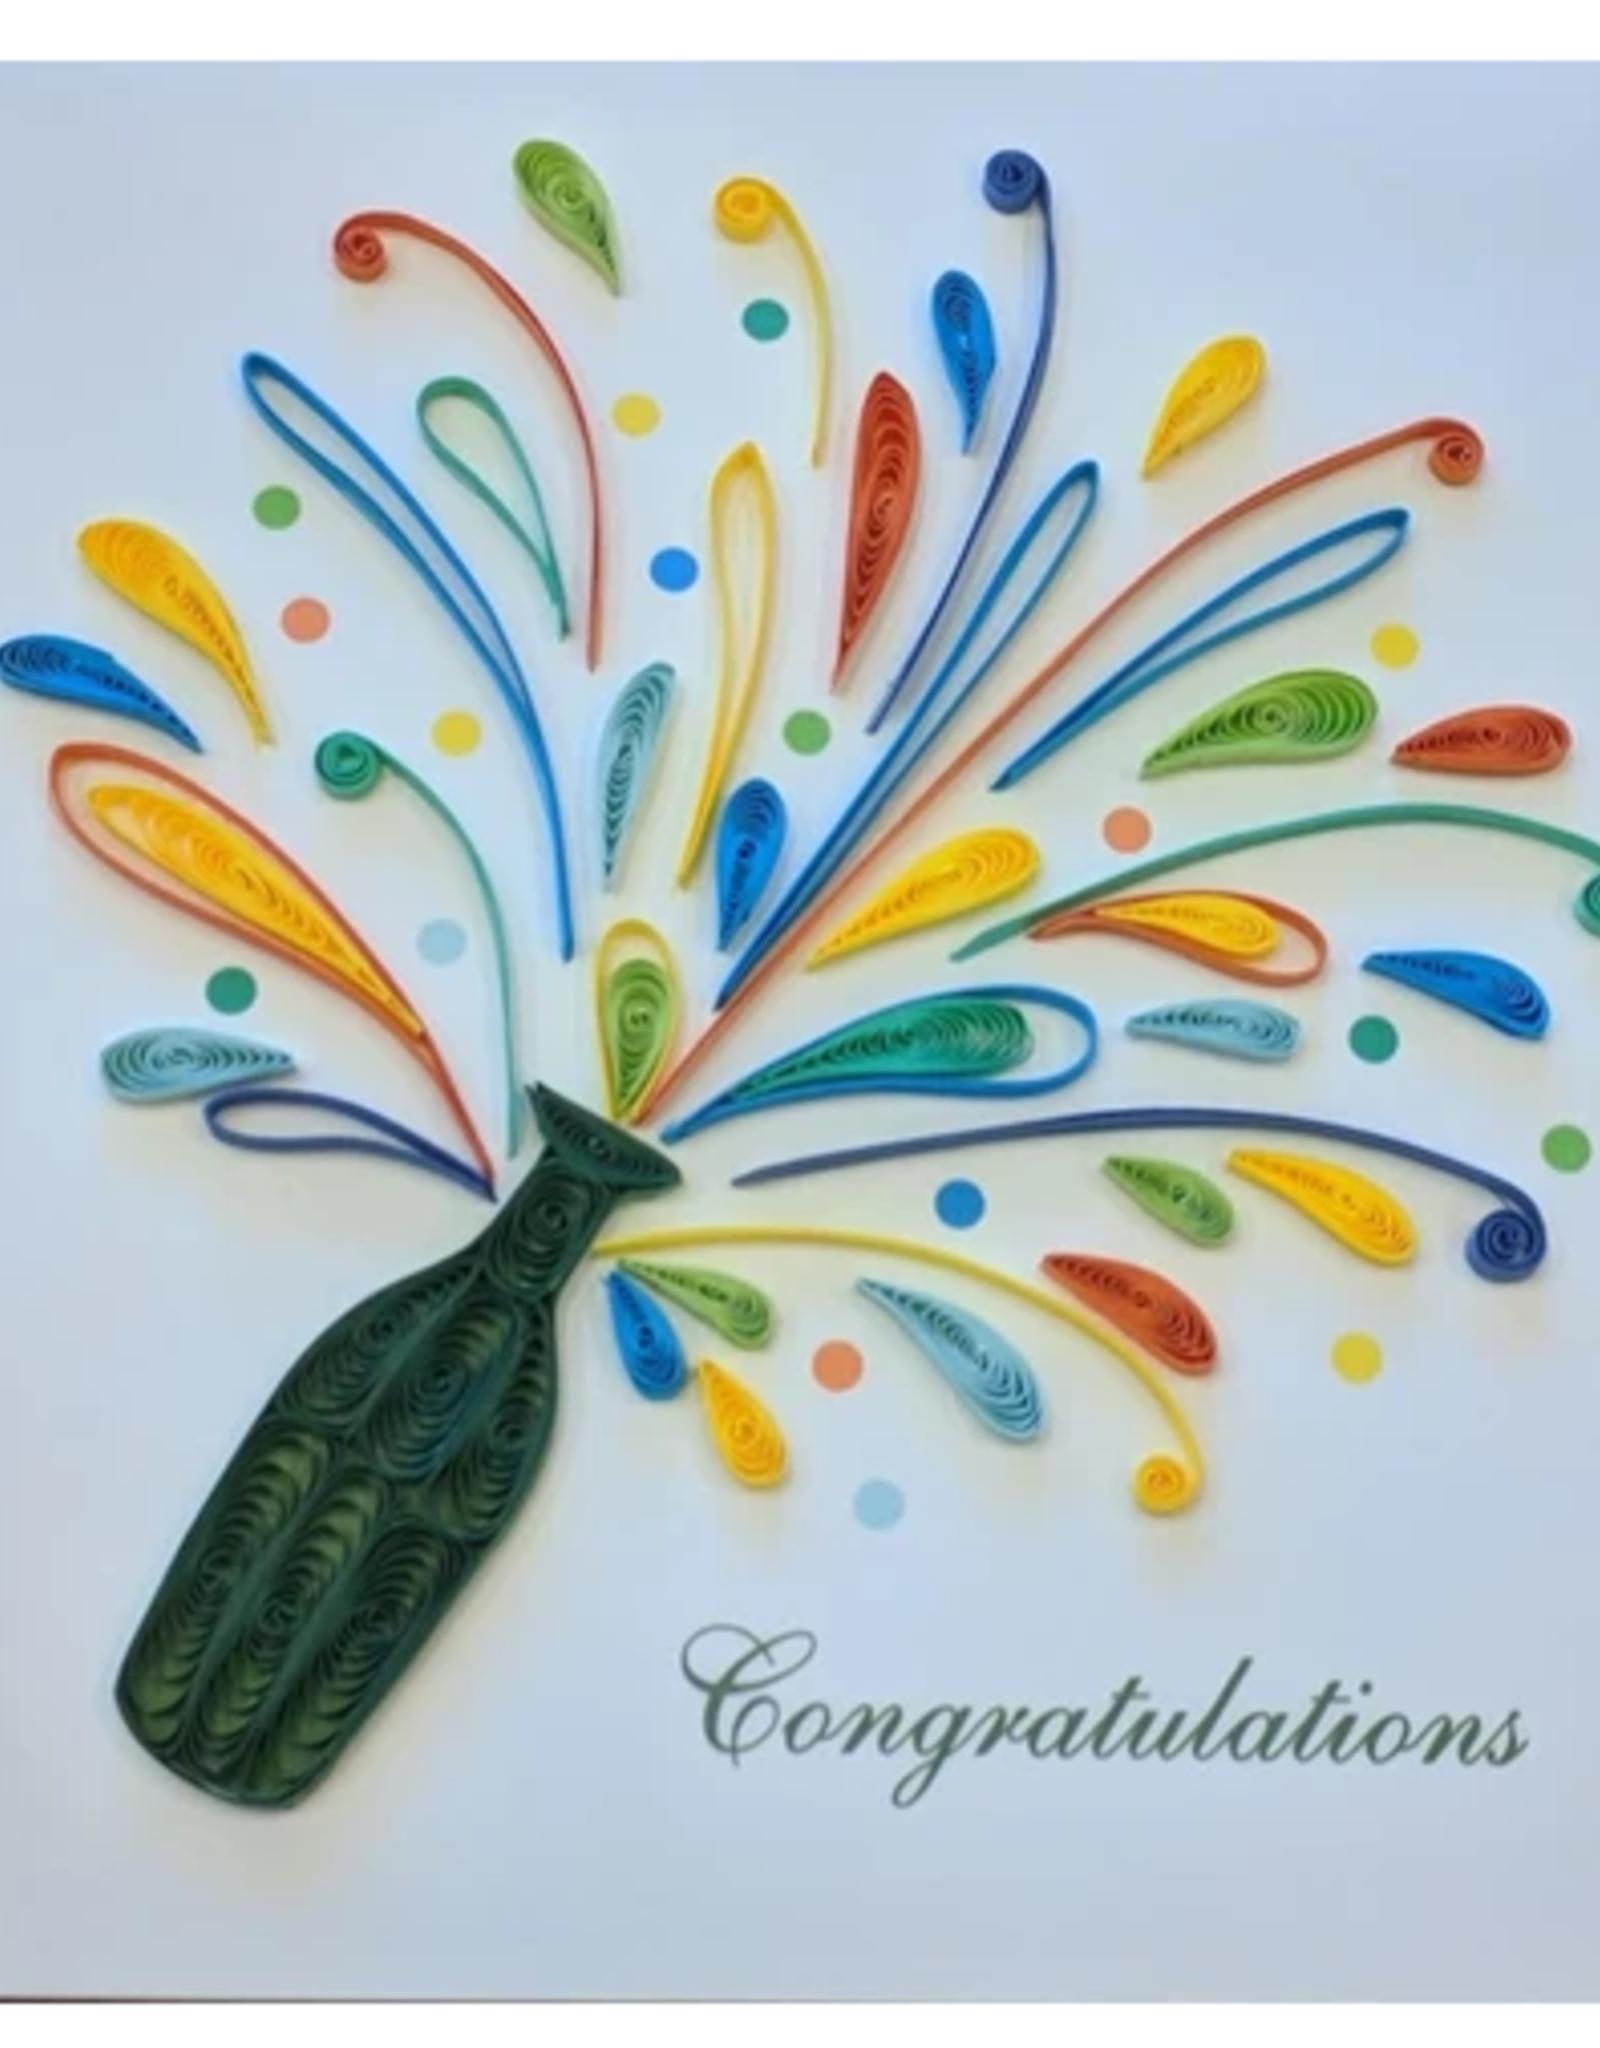 Celebration Congrats Quilling Card